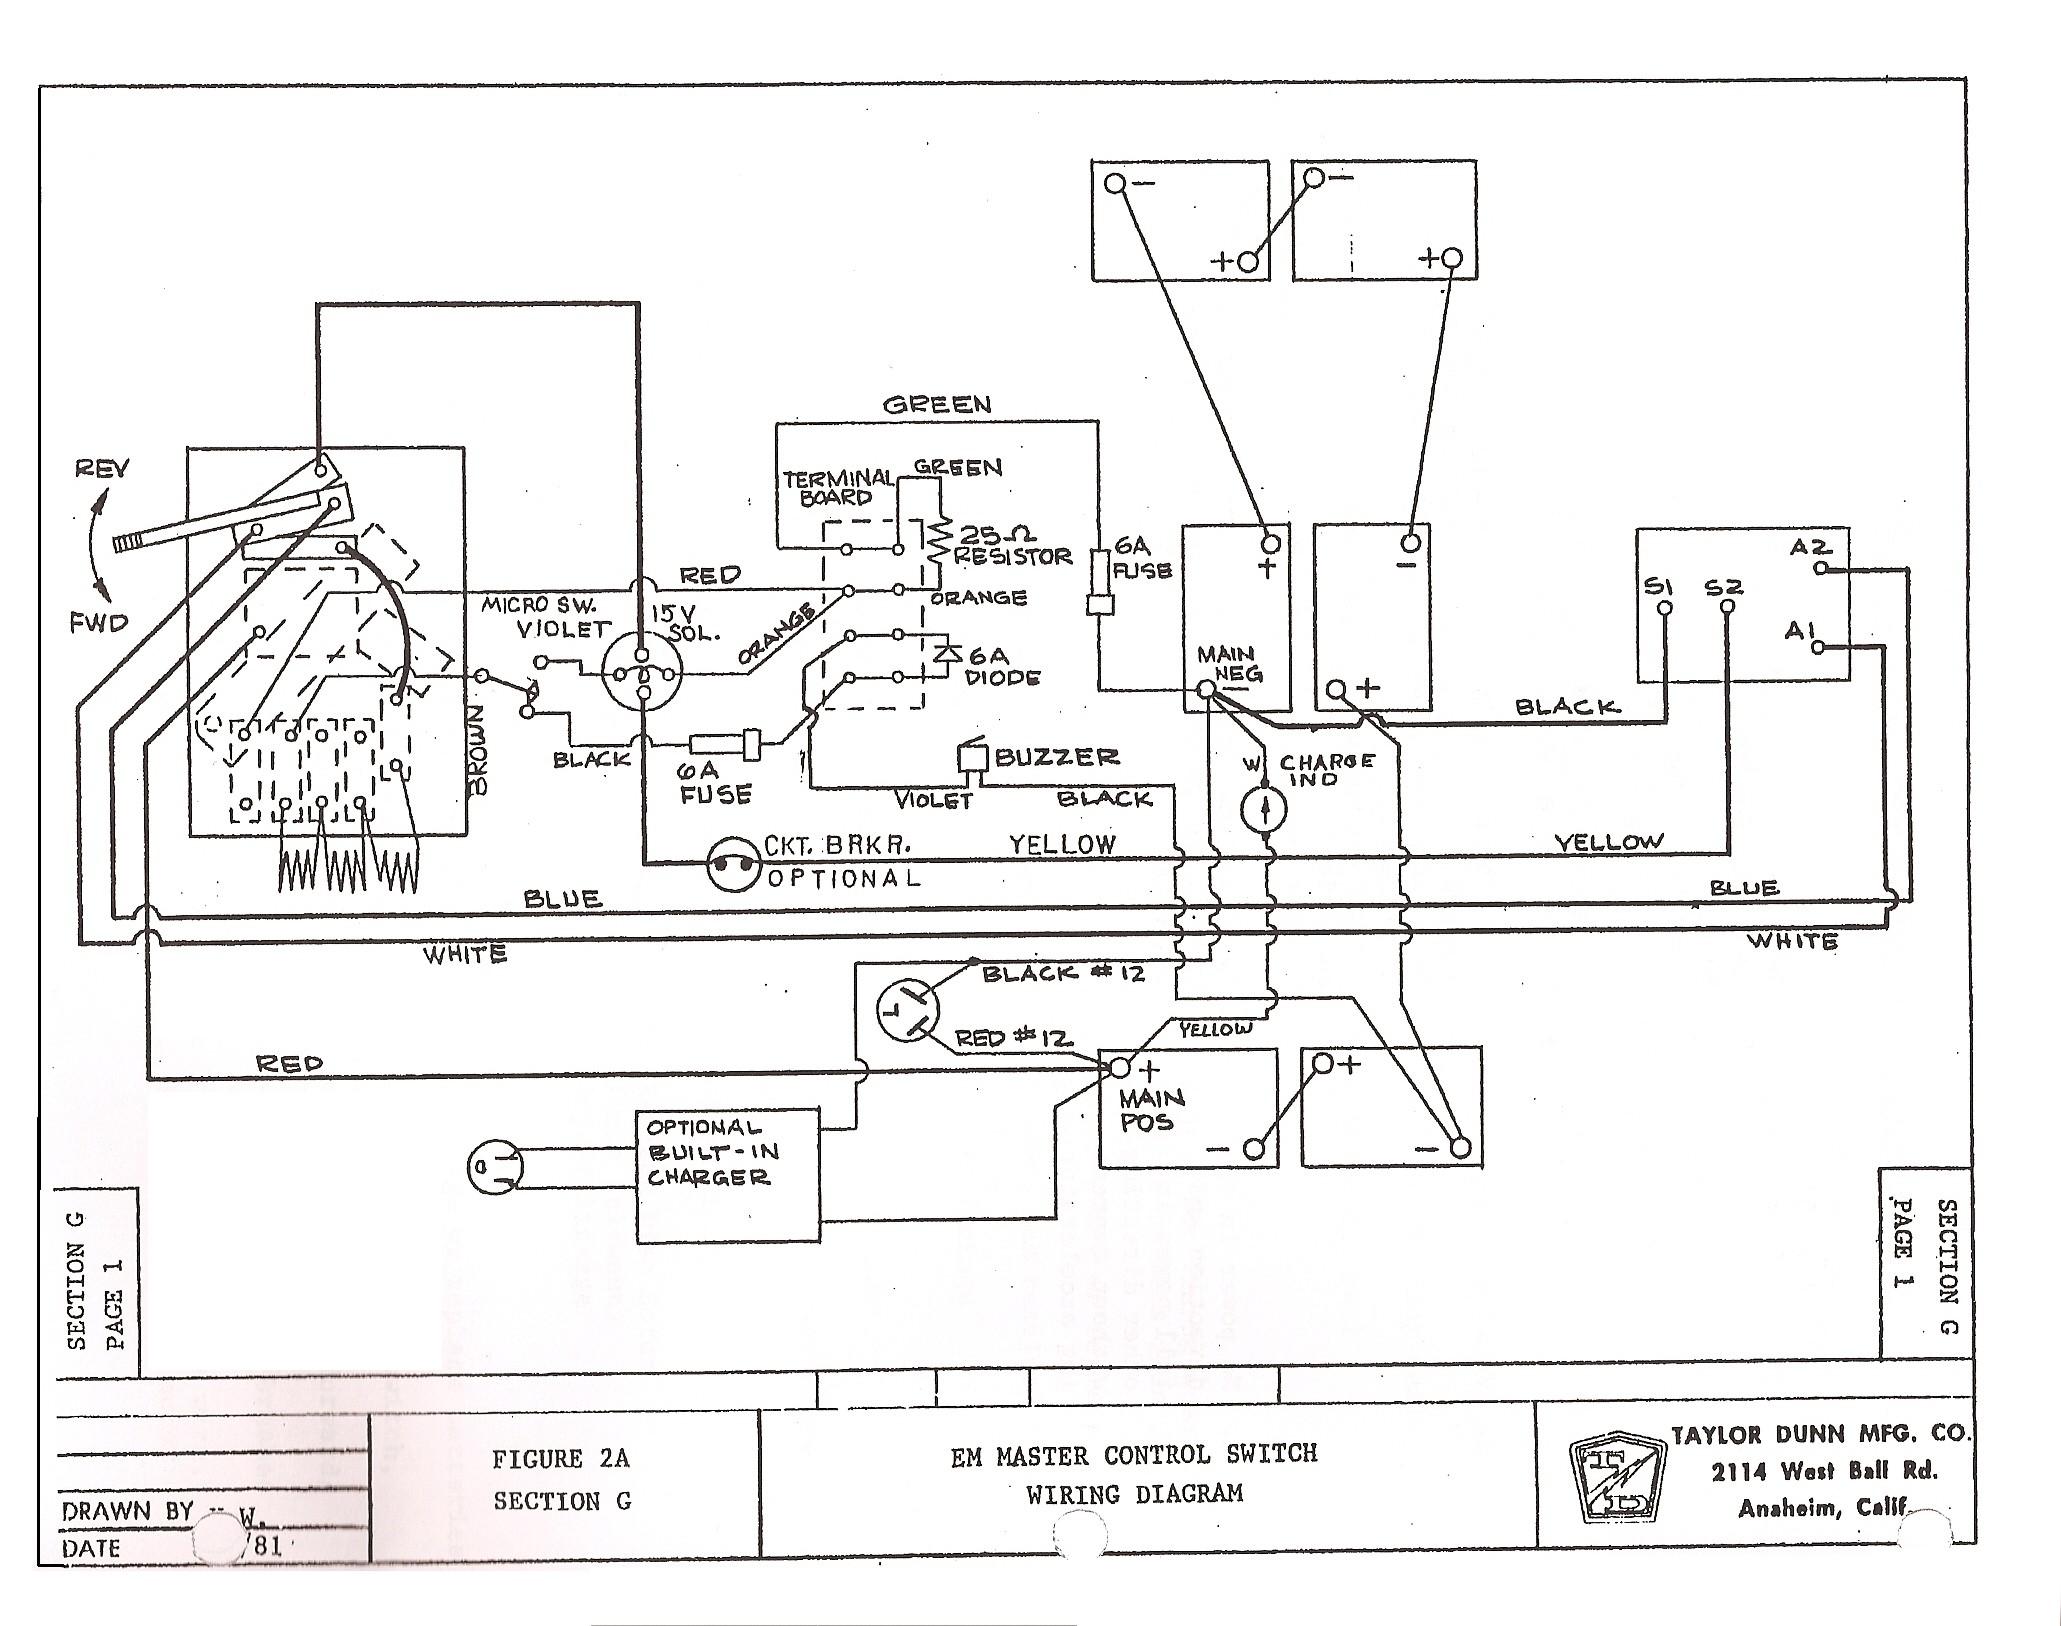 1994 Ezgo Gas Engine Wiring Diagram so 6041] Cart Wiring Diagram Harley Davidson Golf Cart Of 1994 Ezgo Gas Engine Wiring Diagram